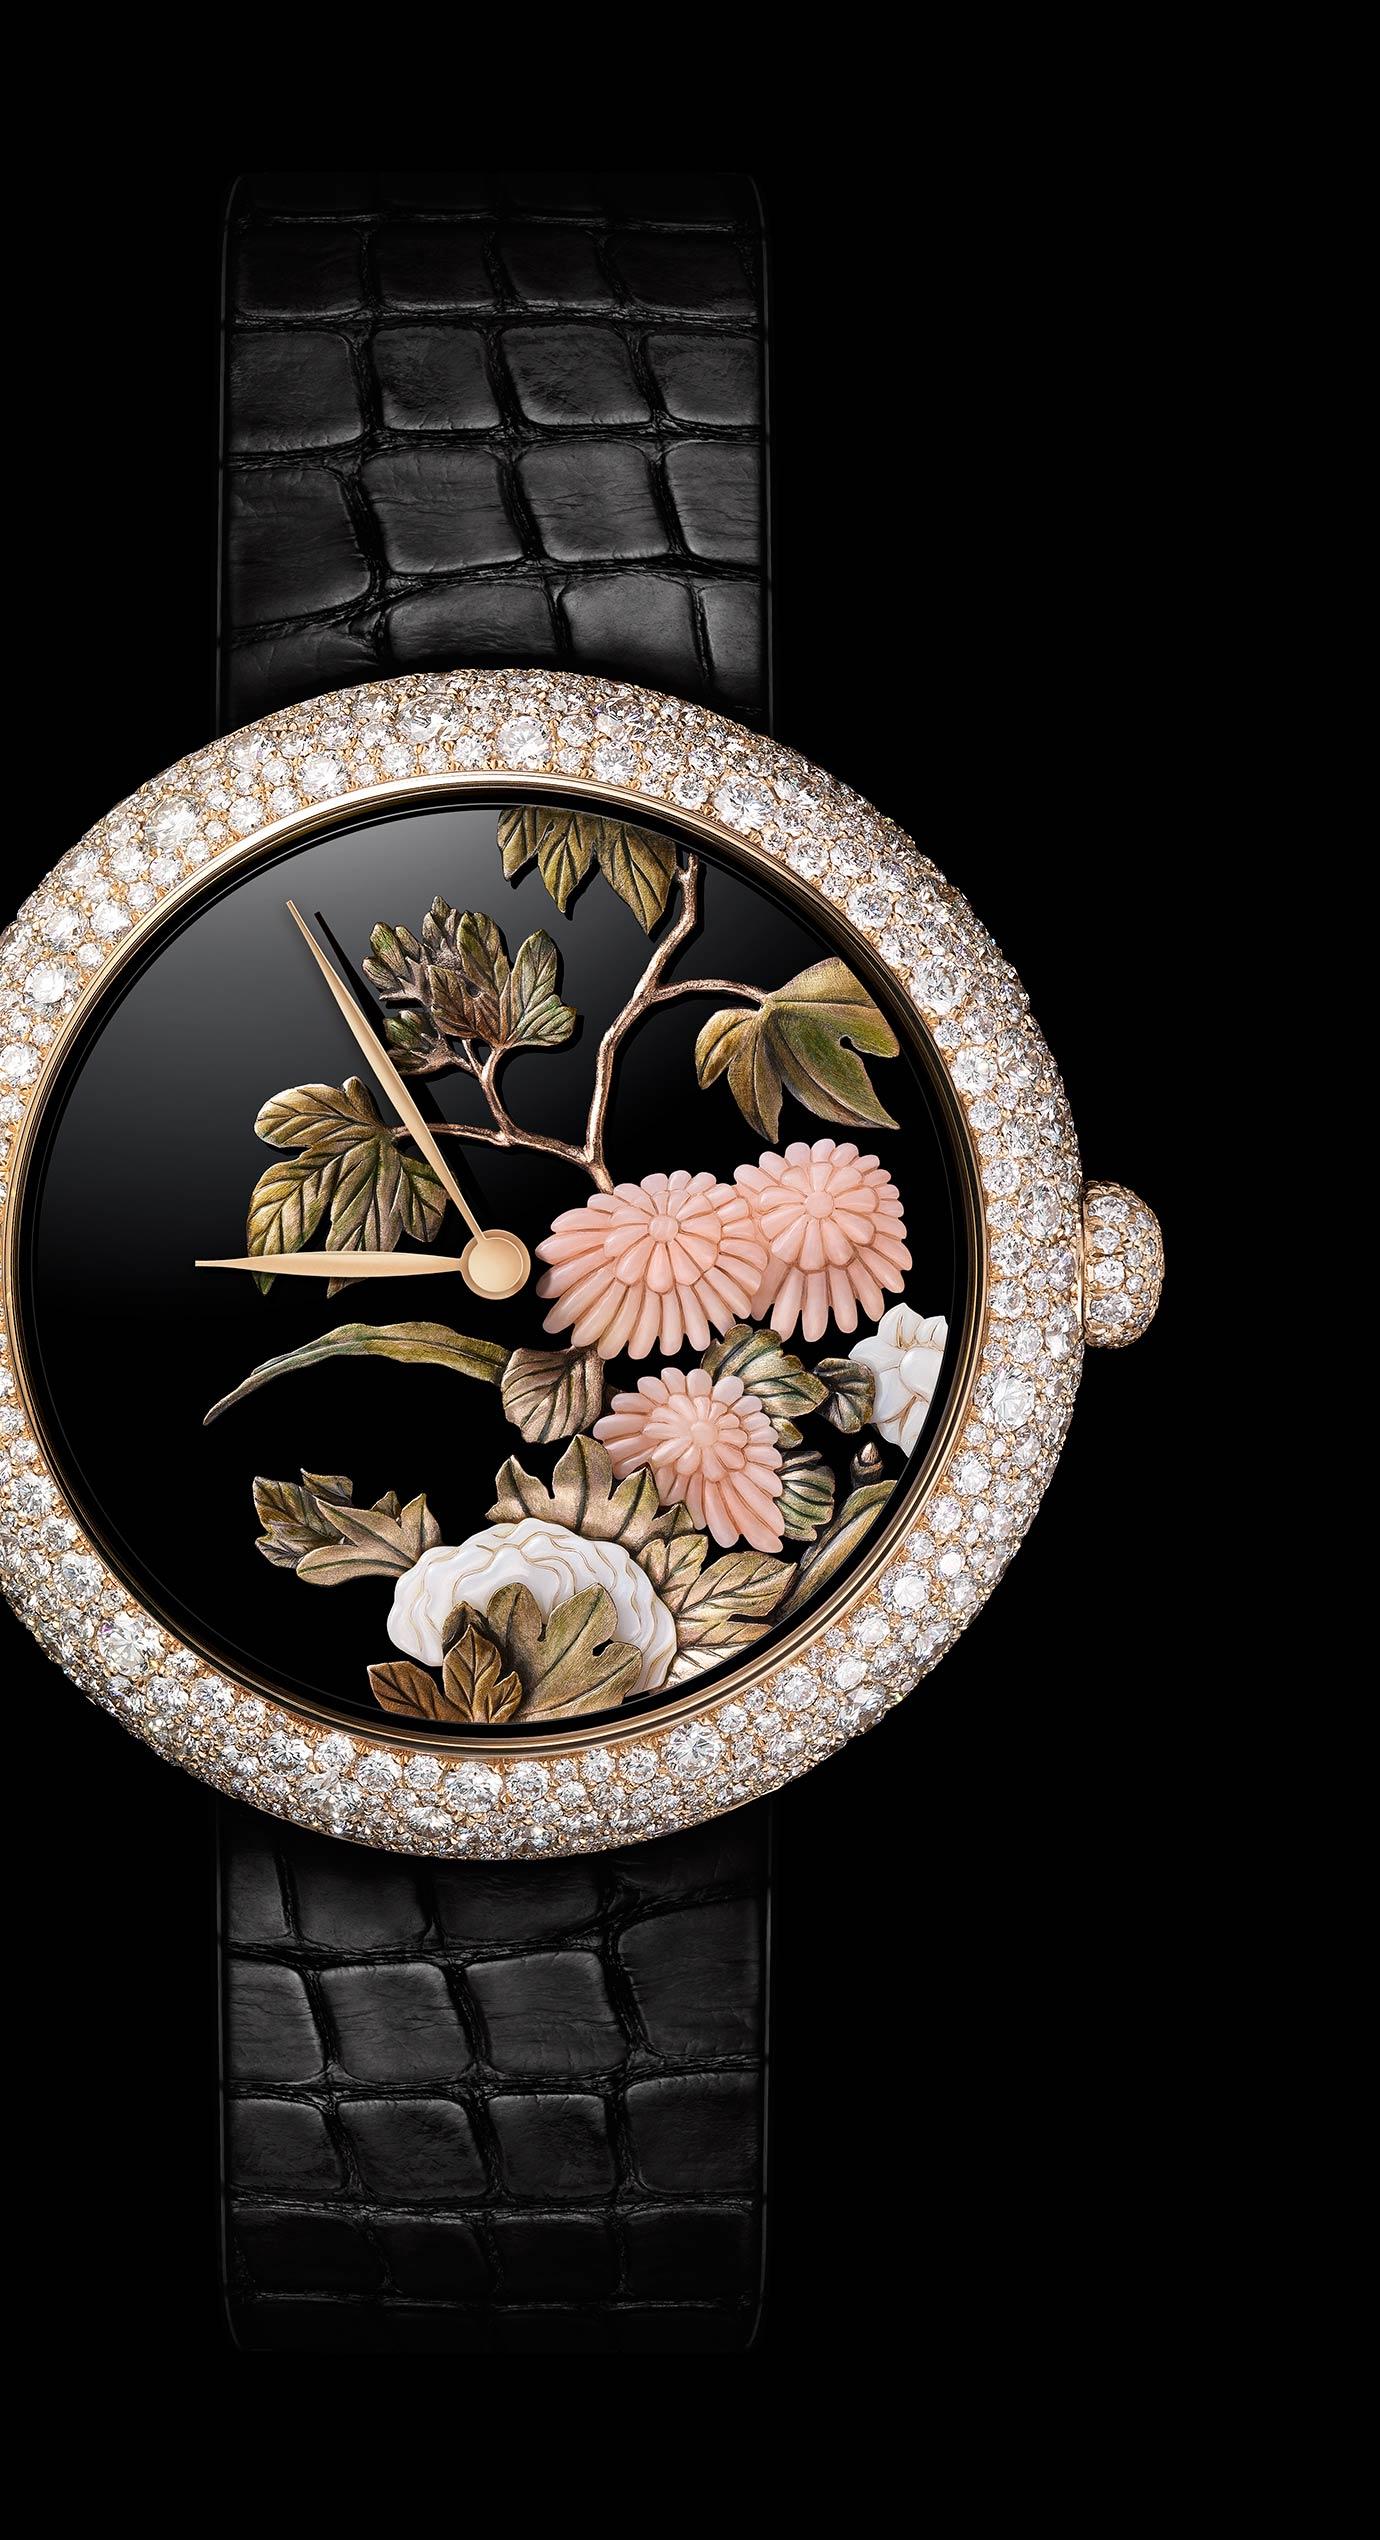 Reloj Mademoiselle Privé Coromandel realizado según la técnica del oro esculpido. - Vista ampliada